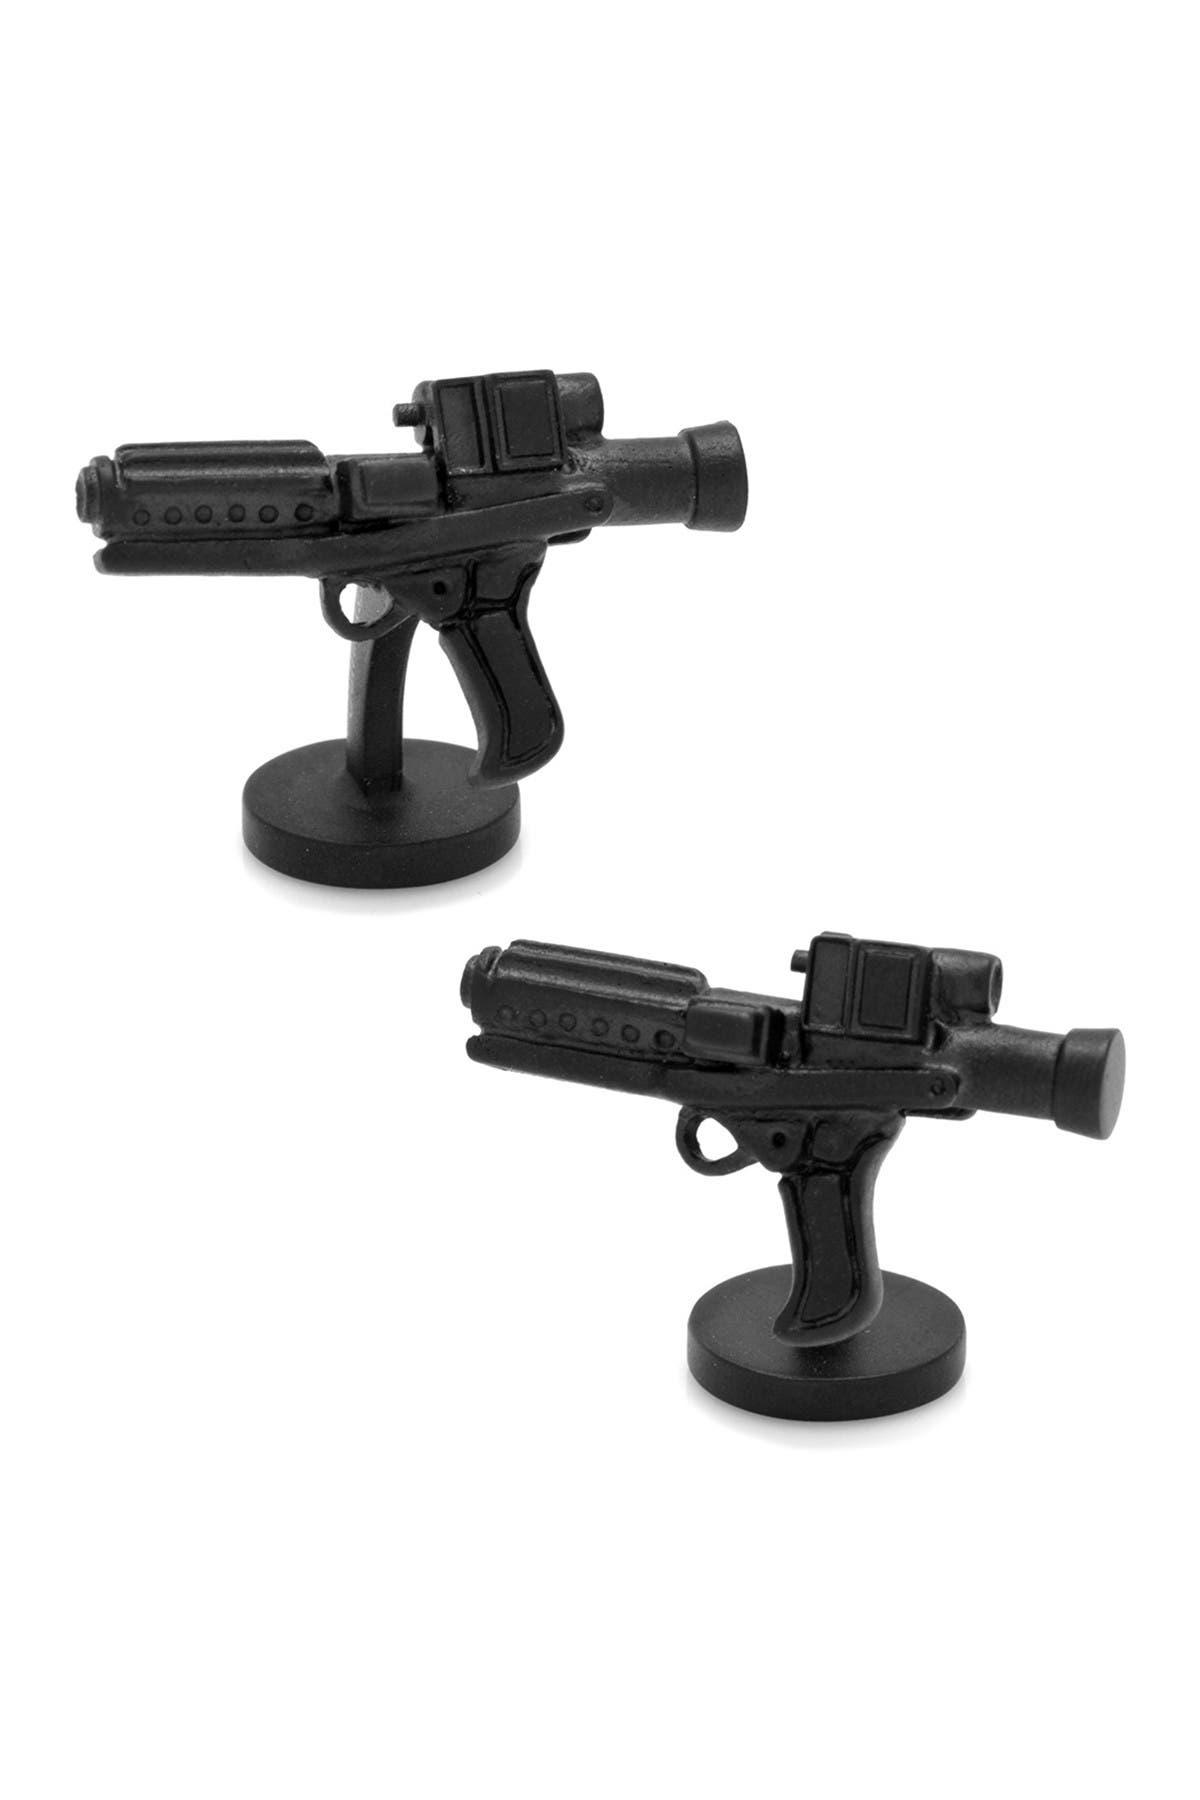 Image of Cufflinks Inc. x Star Wars 3D Stormtrooper E-11 Blaster Cuff Links